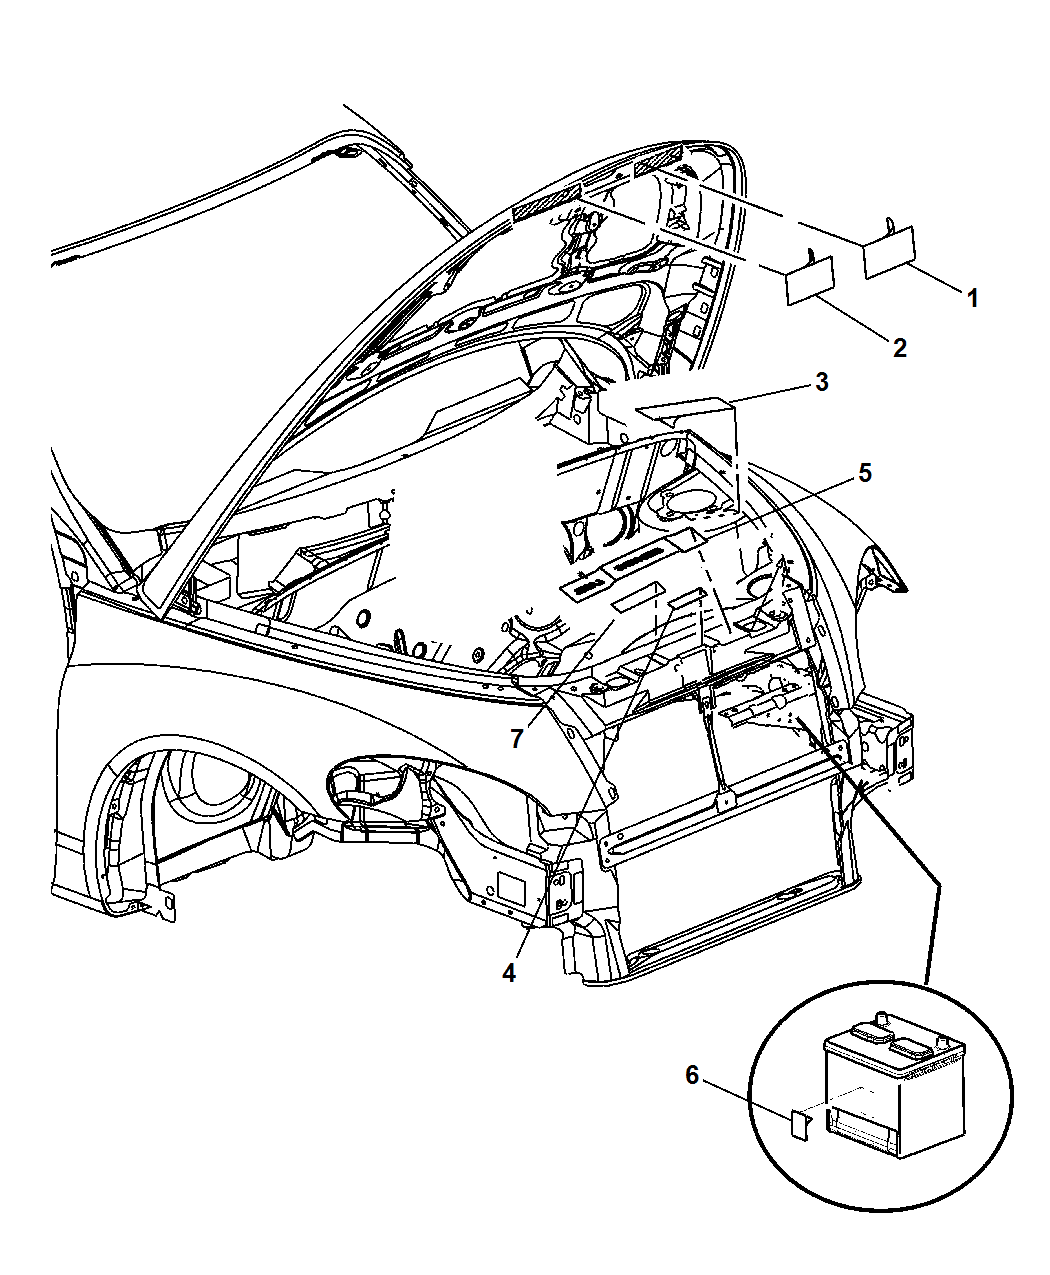 2006 Pt Cruiser Engine Diagram Wiring Diagram System Drink Locate A Drink Locate A Ediliadesign It